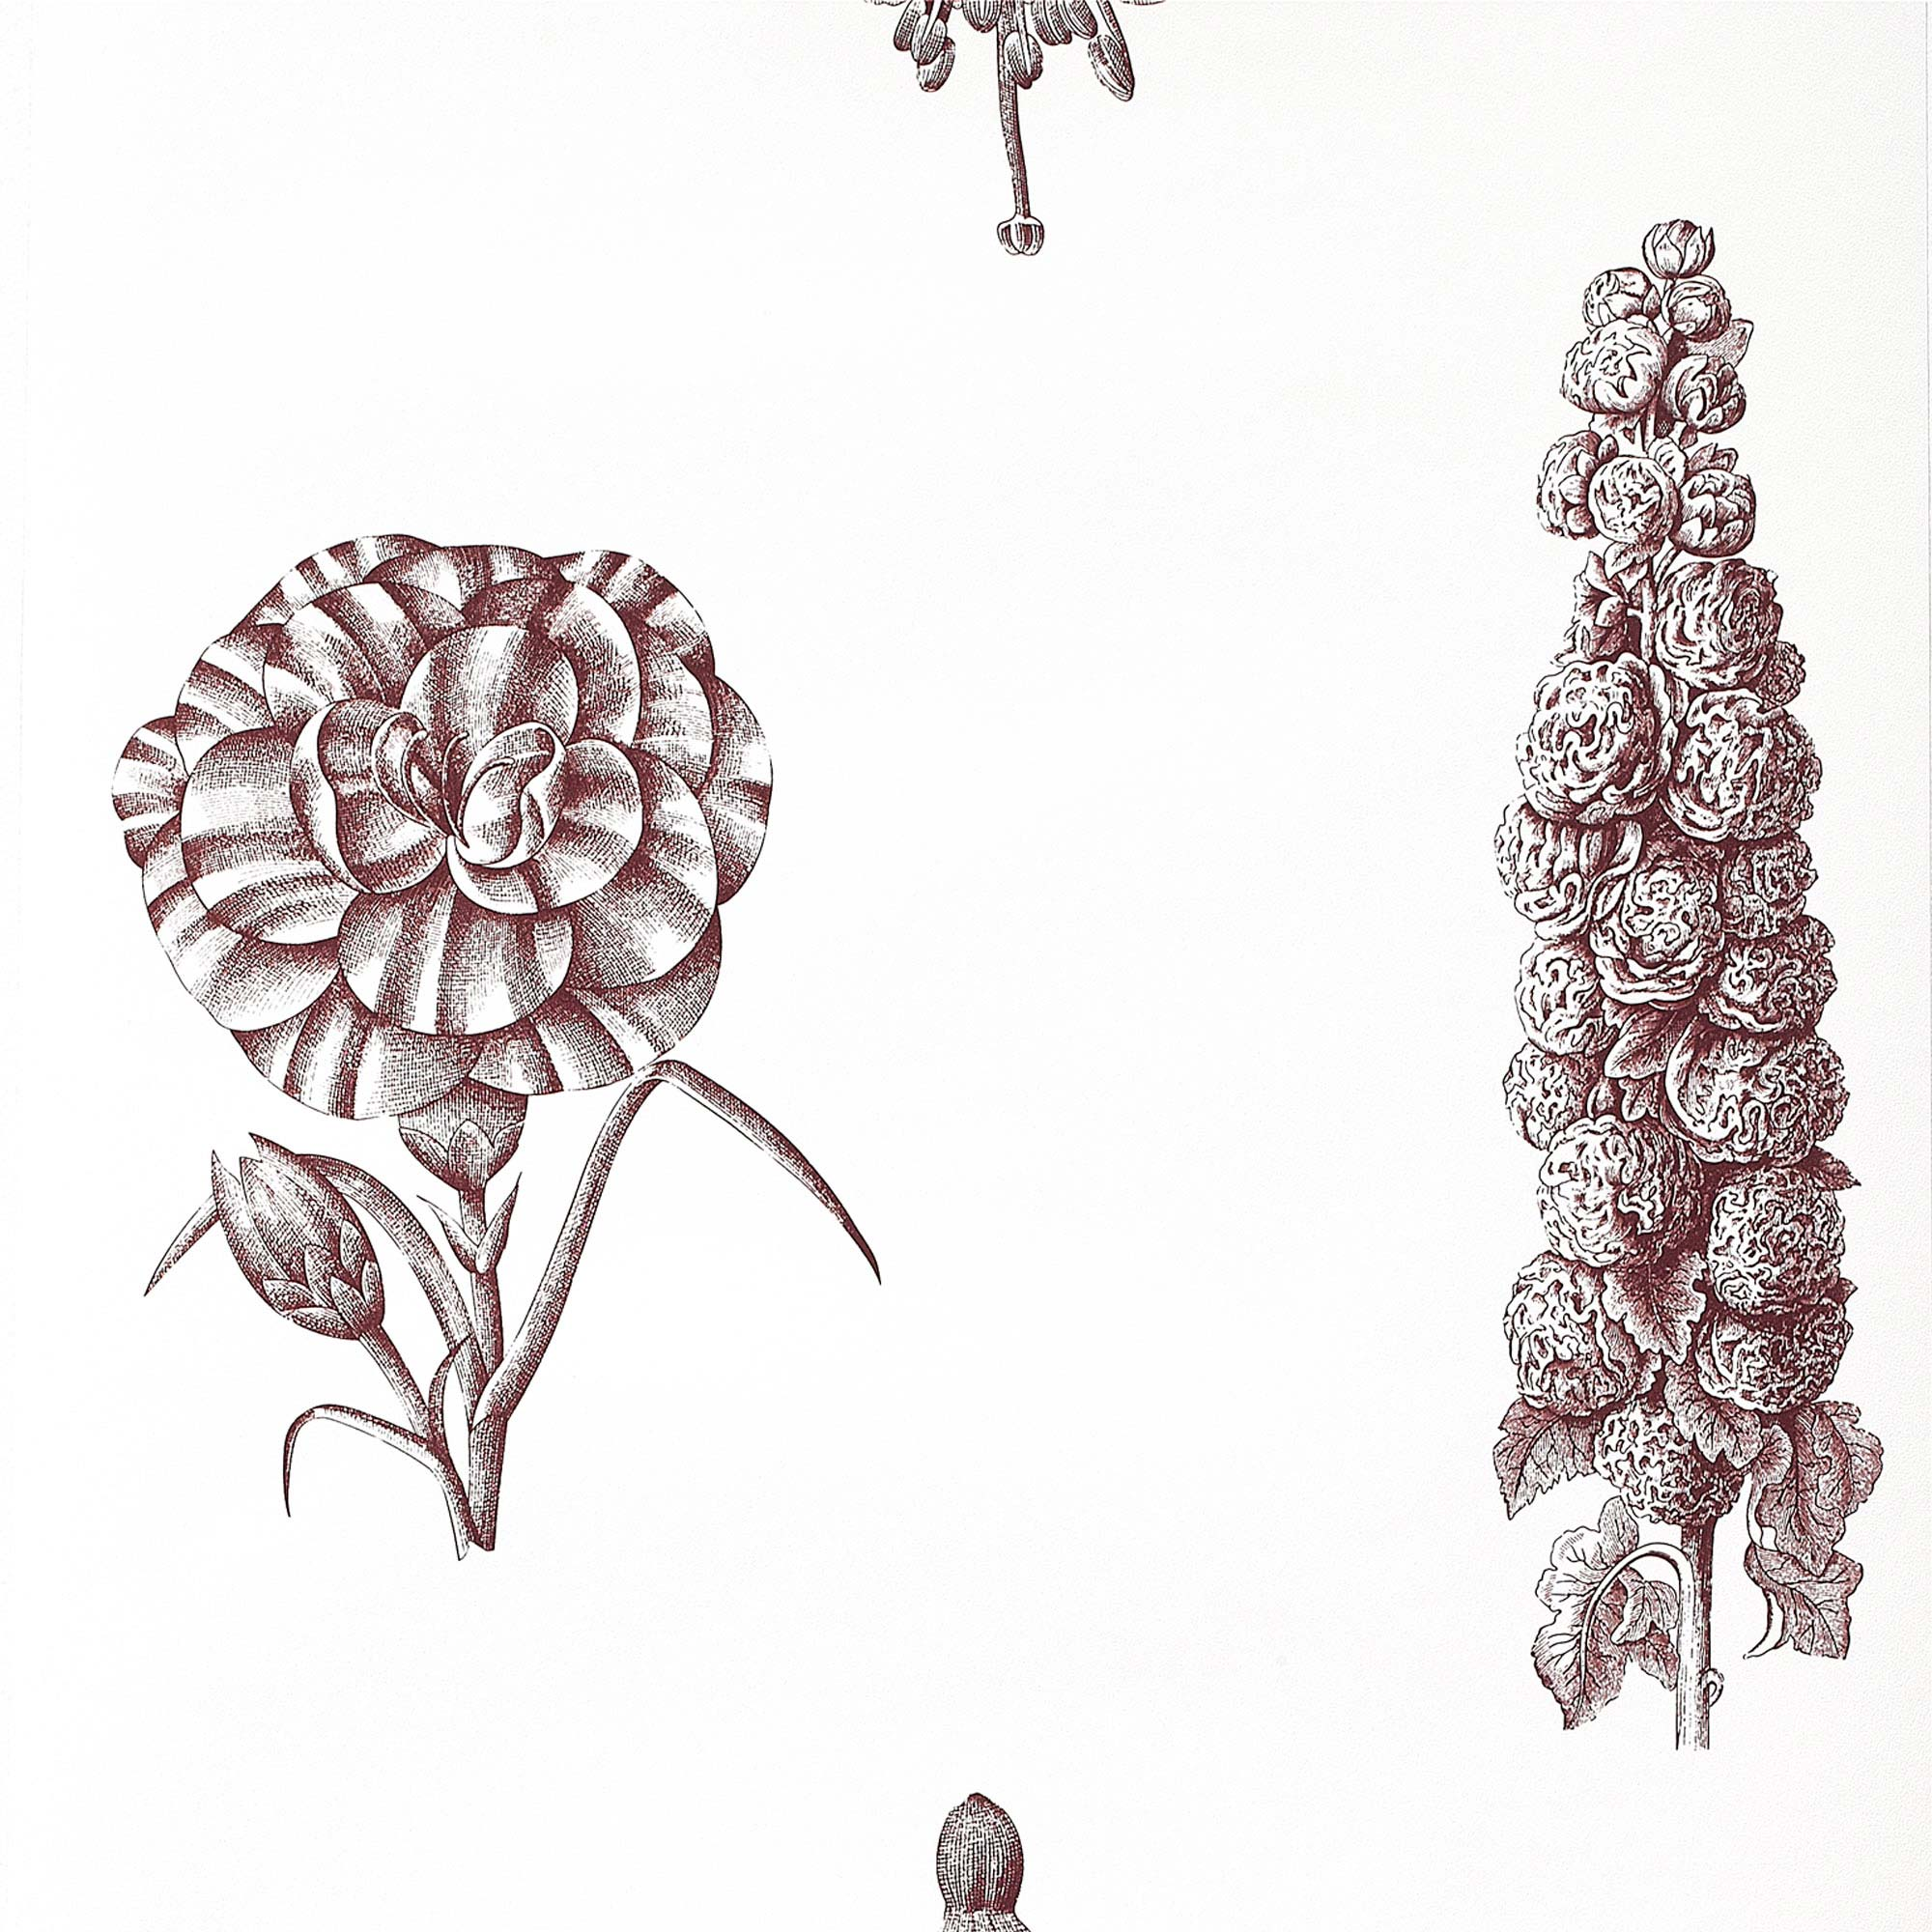 Испанские обои Gaston y Daniela,  коллекция Origen, артикулGDW-4854-003